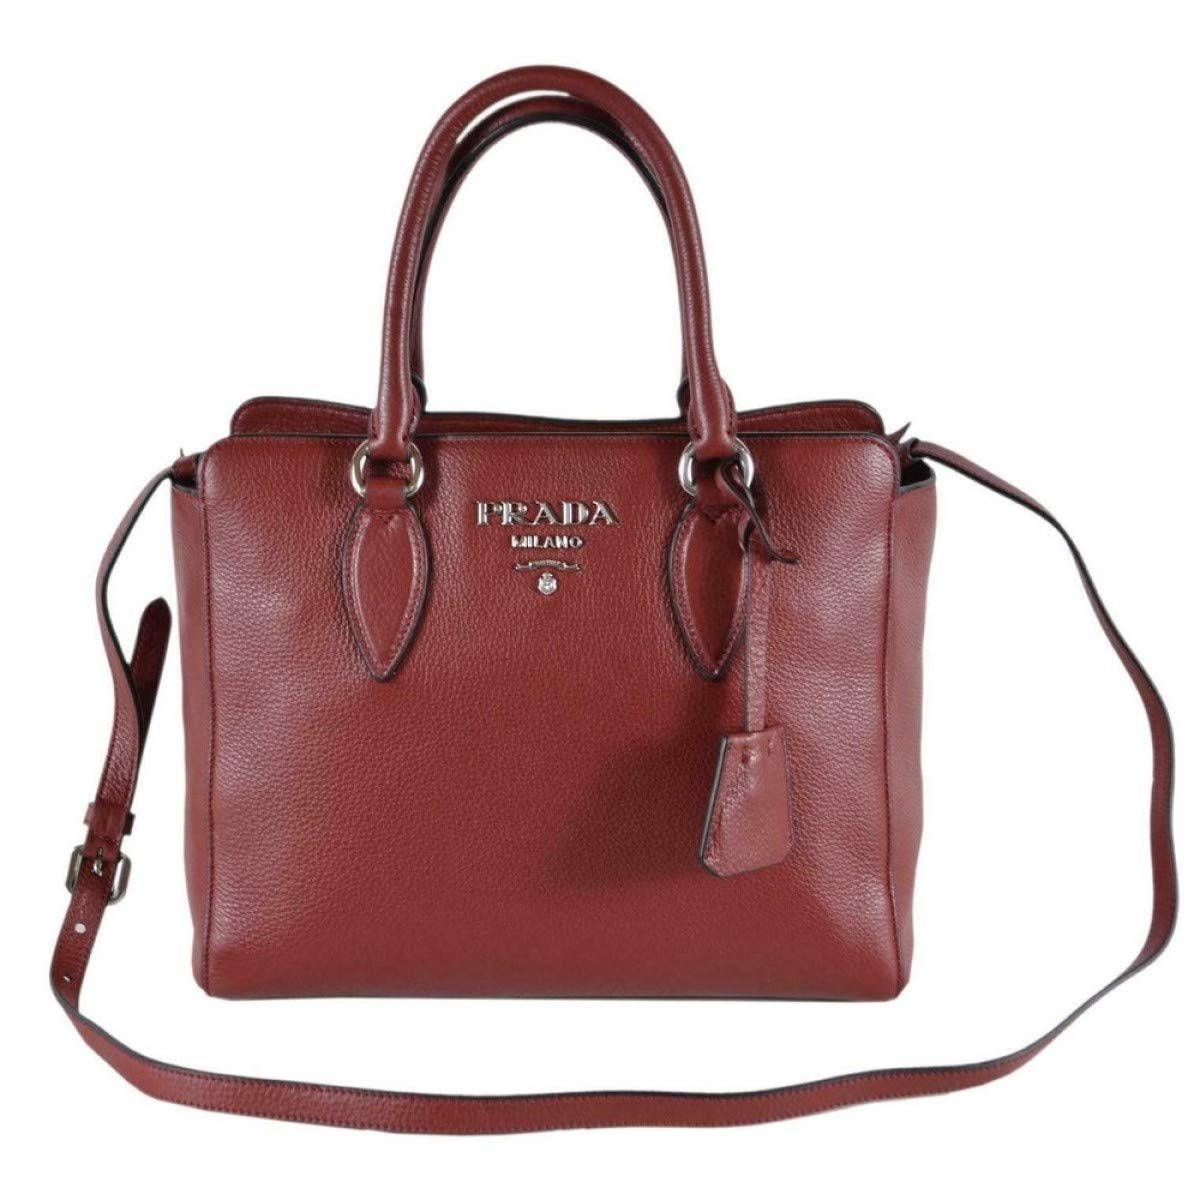 Prada Vitello Phenix Rubino Burgundy Small Crossbody Satchel Handbag